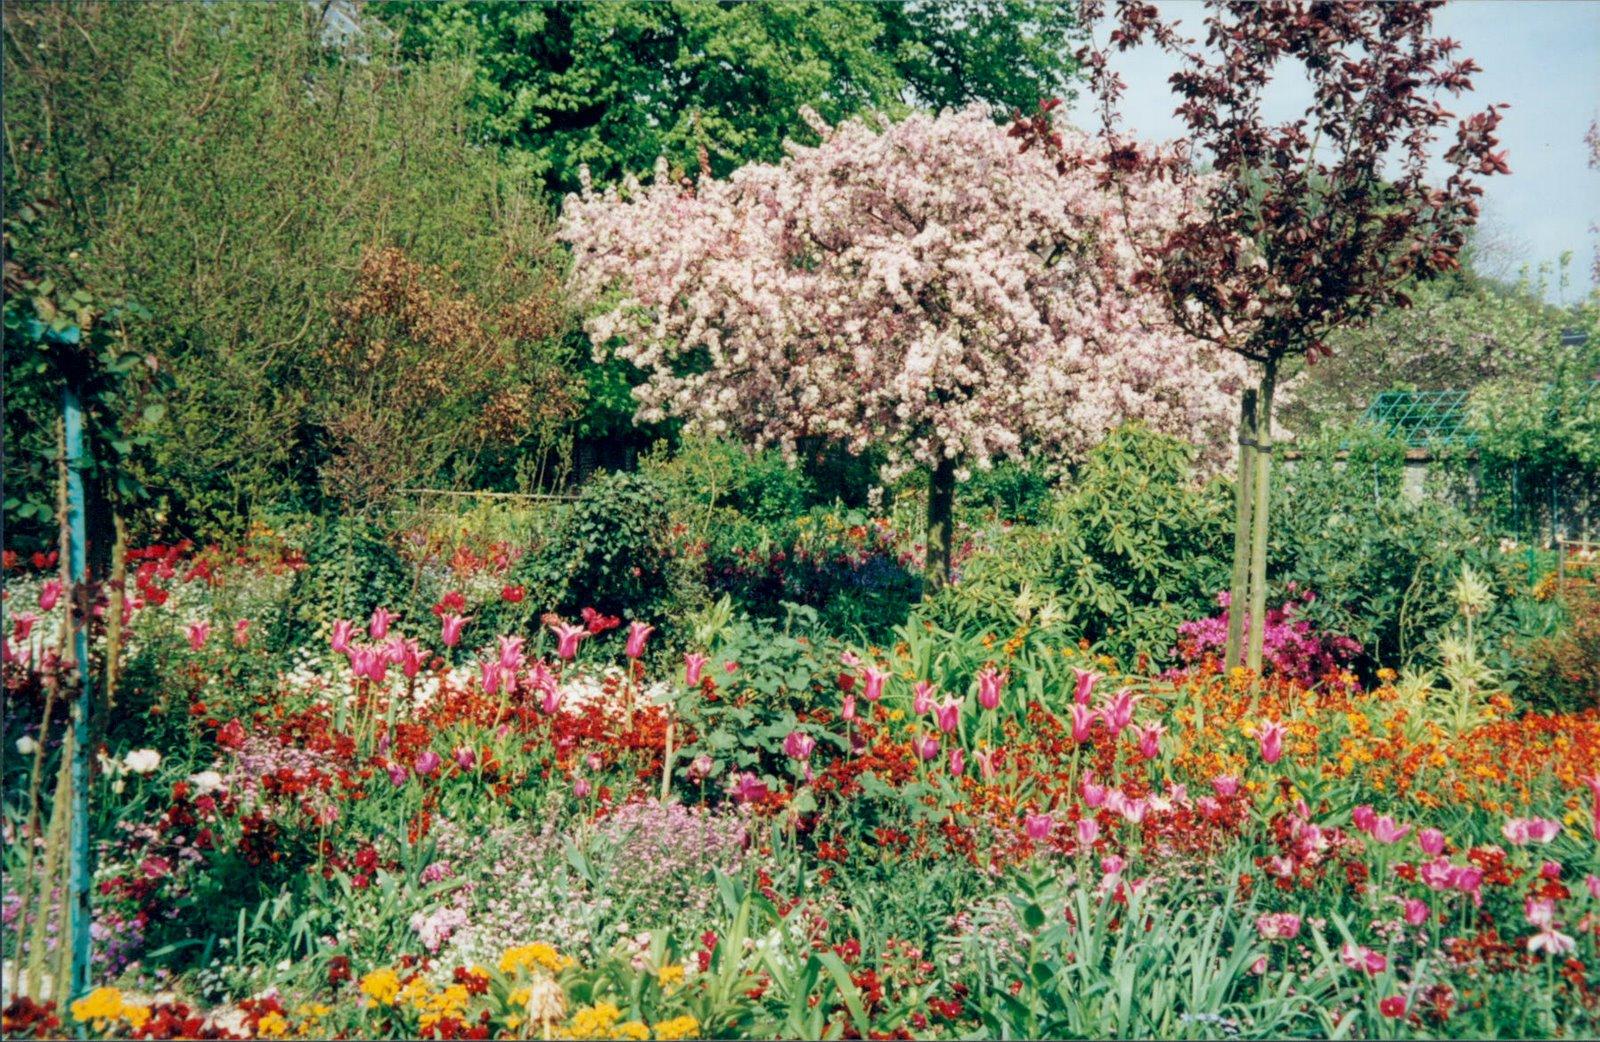 Spring blossoms in Monet's garden